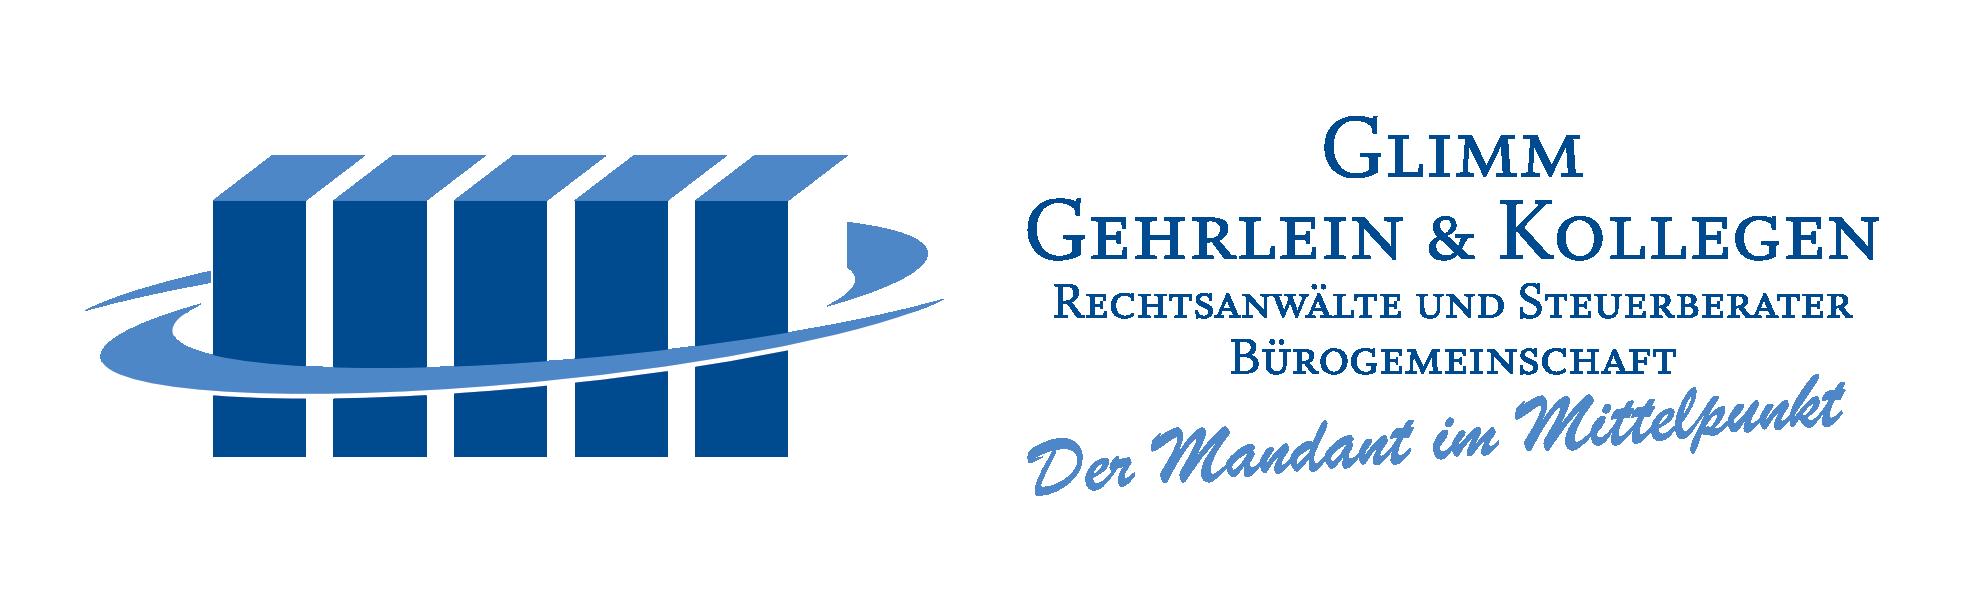 Logo Glimm, Gehrlein & Kollegen Bürogemeinschaft